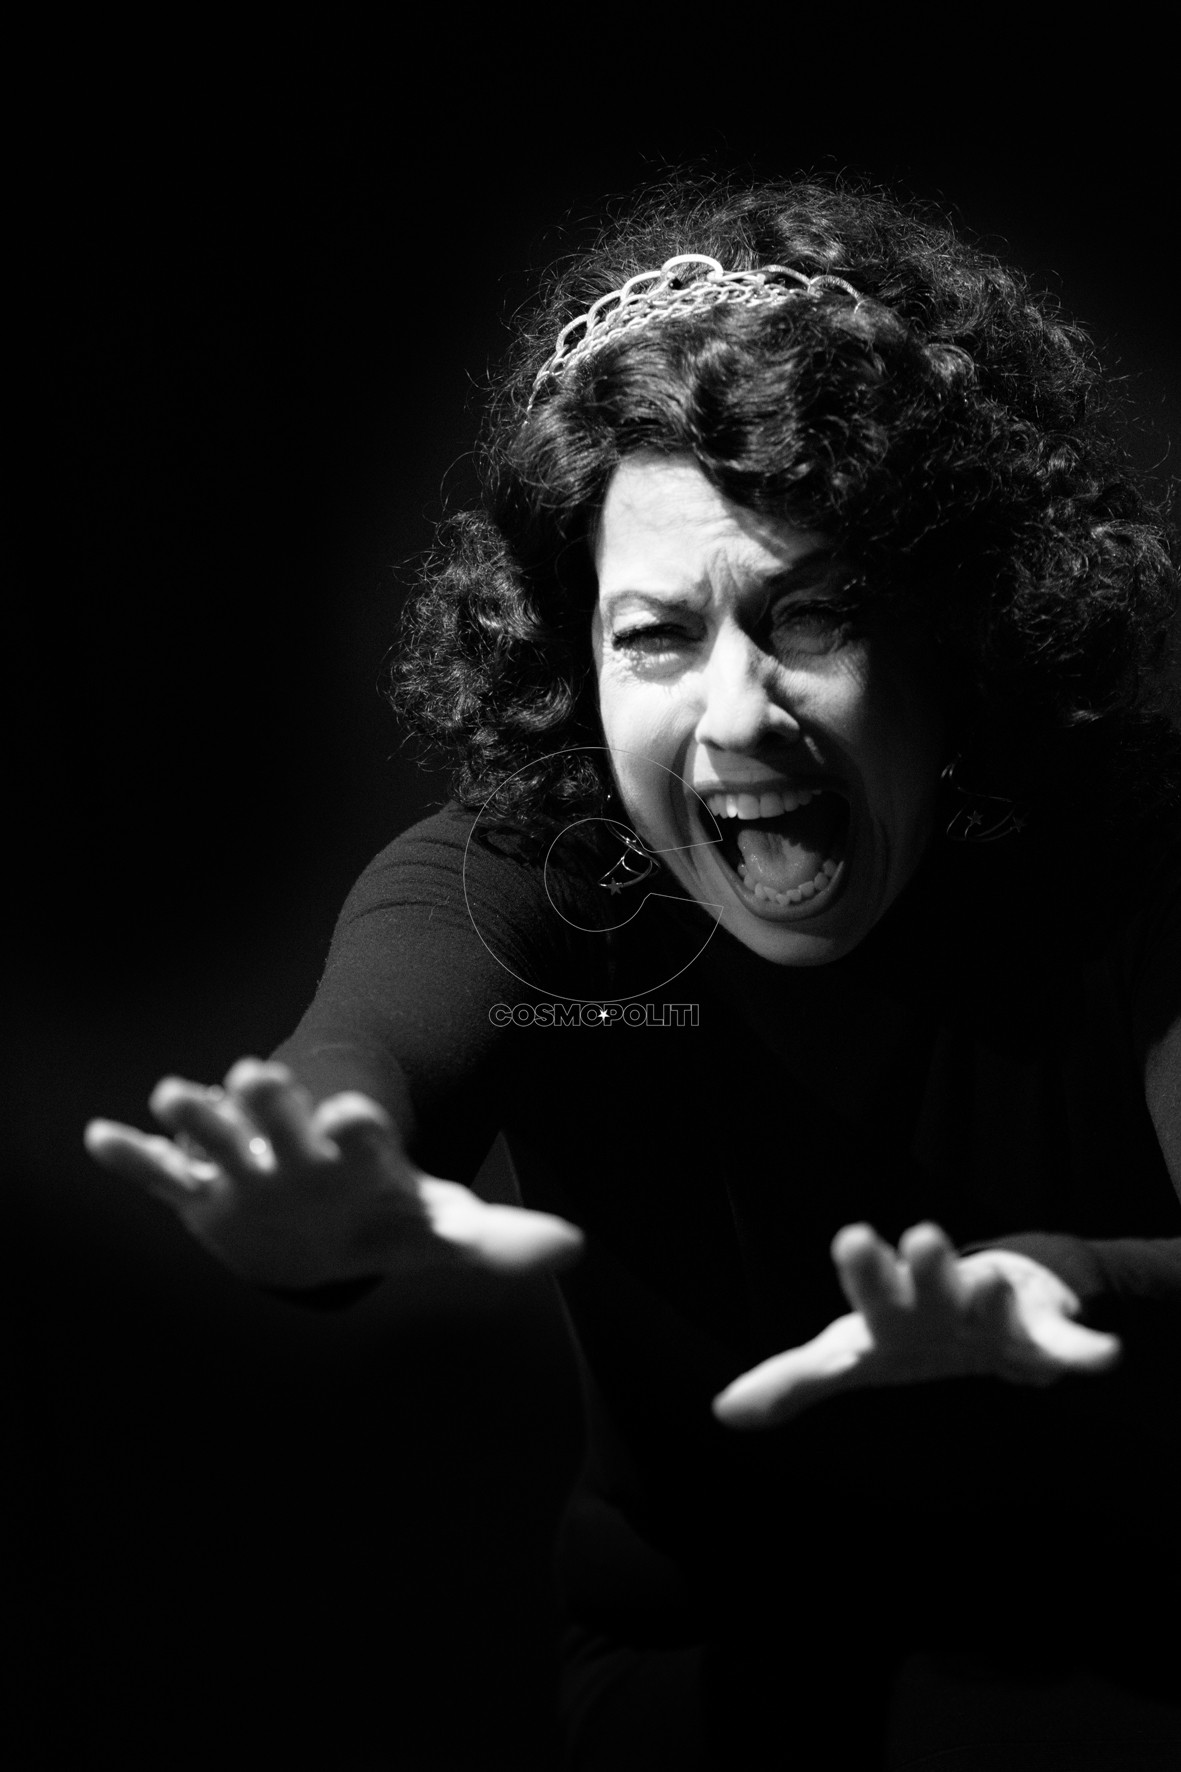 ''ROZA ESKENAZY'' NEFELH ORFANOY - PHOTO BY BERGADOS GIWRGOS @gvergados